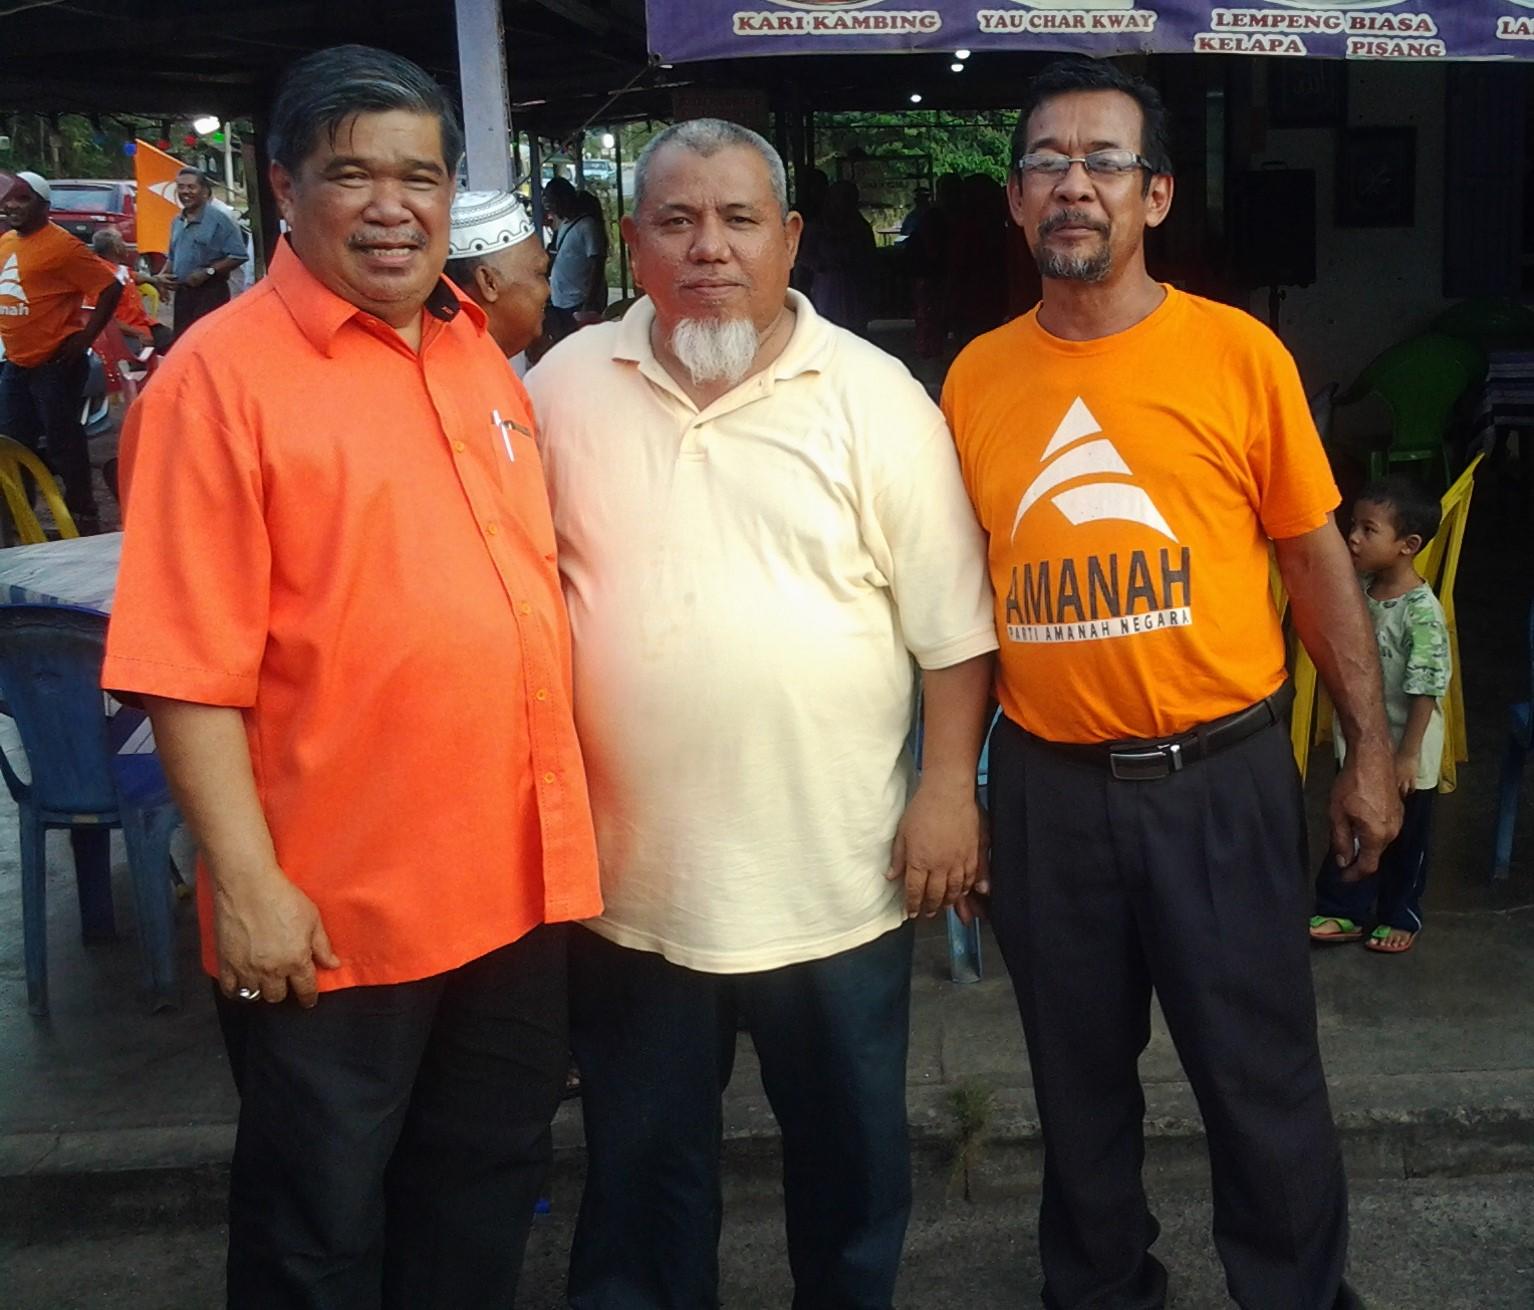 Bersama Hj Mohamad Sabu Presiden AMANAH